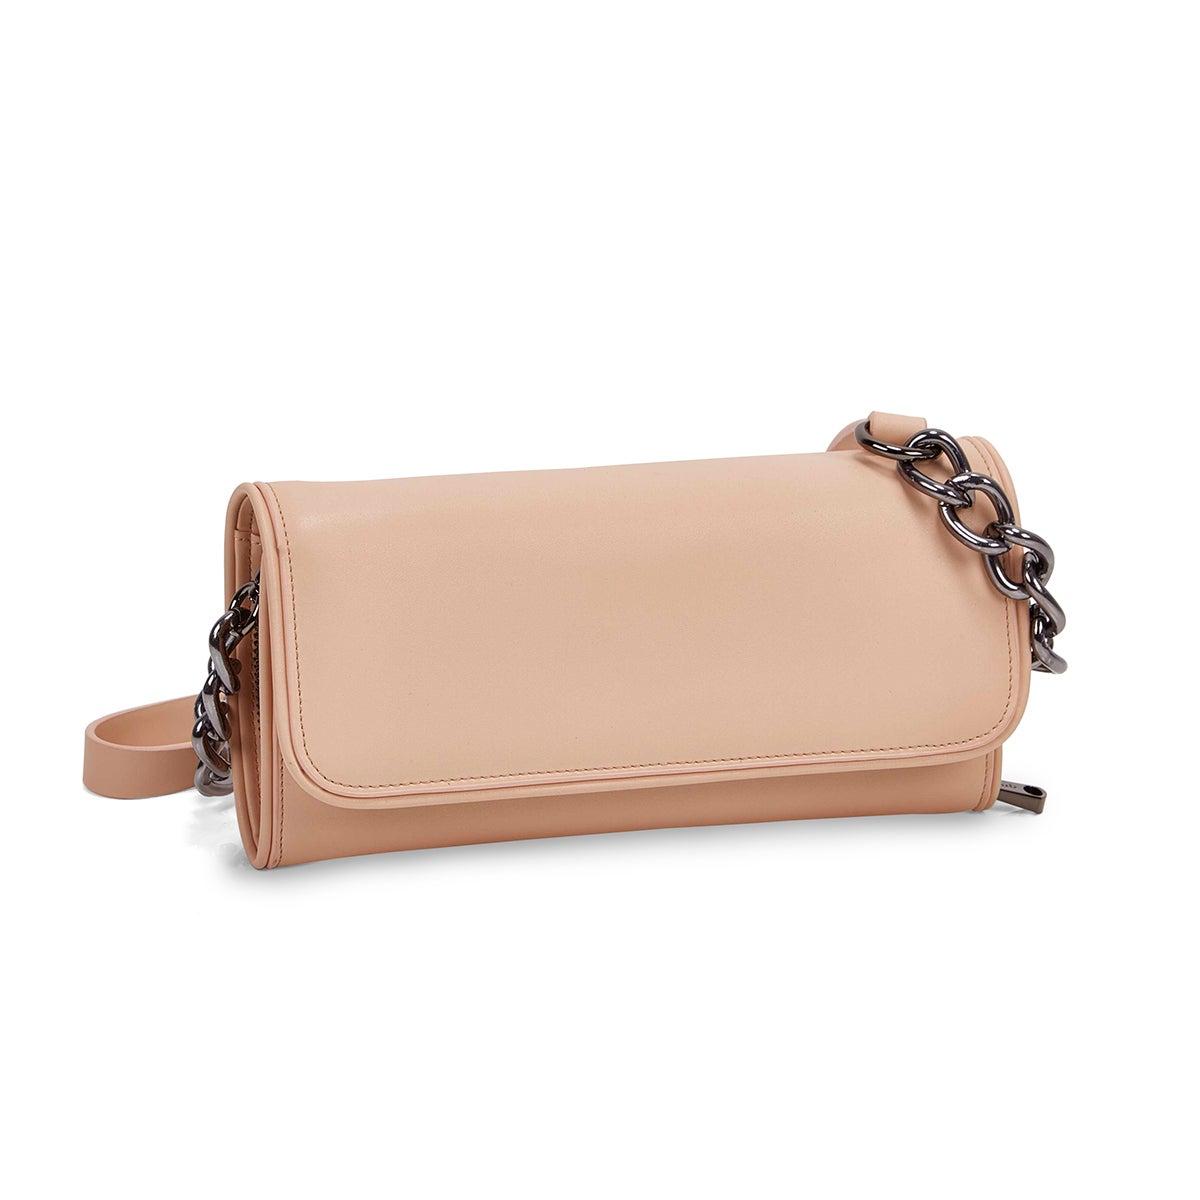 Women's 5563 blush cross body bag